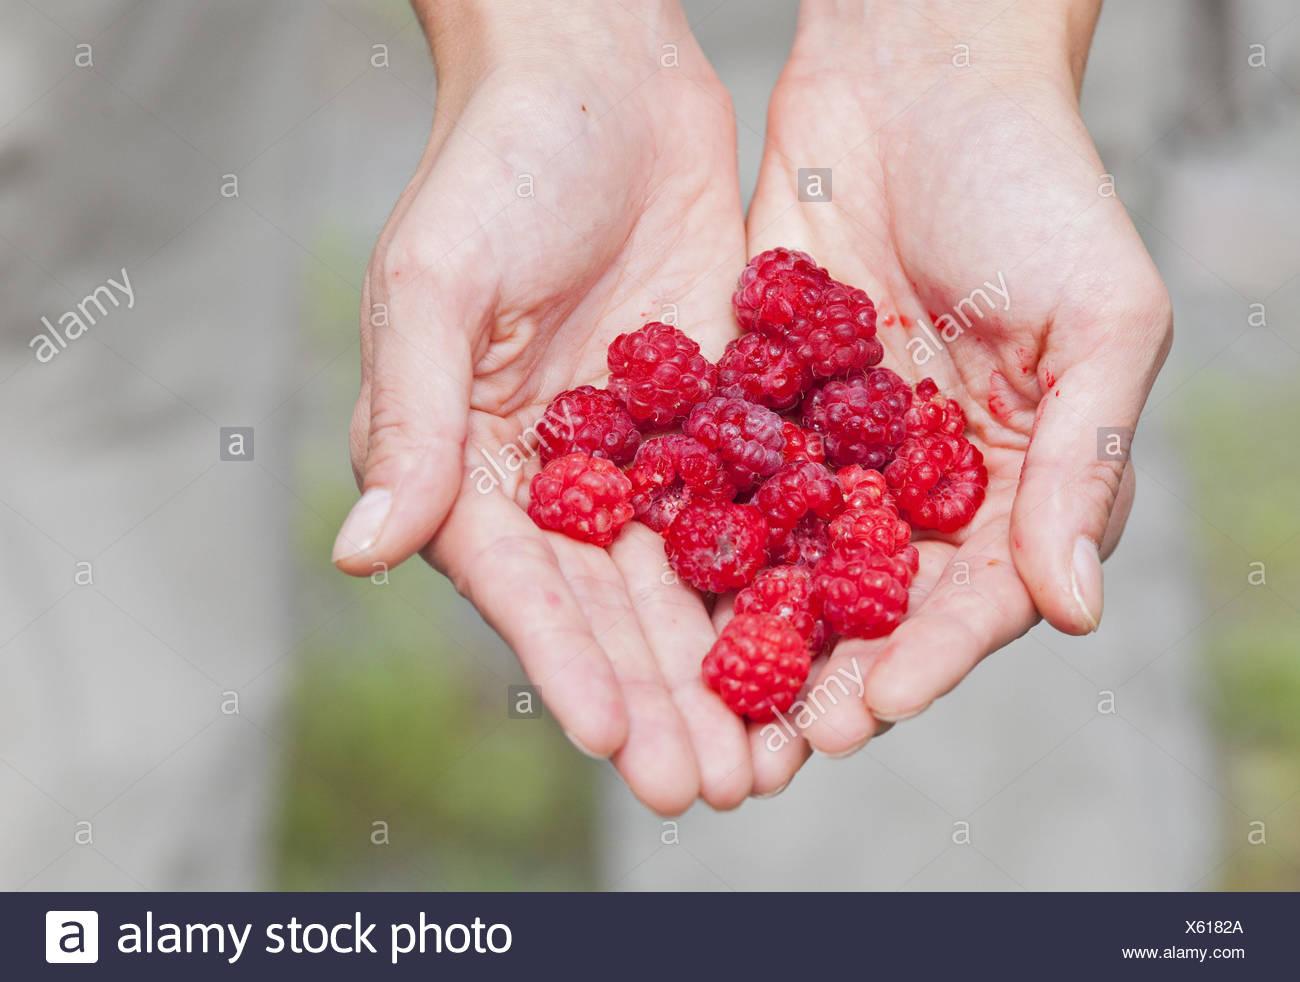 Hands, raspberries, collect, - Stock Image